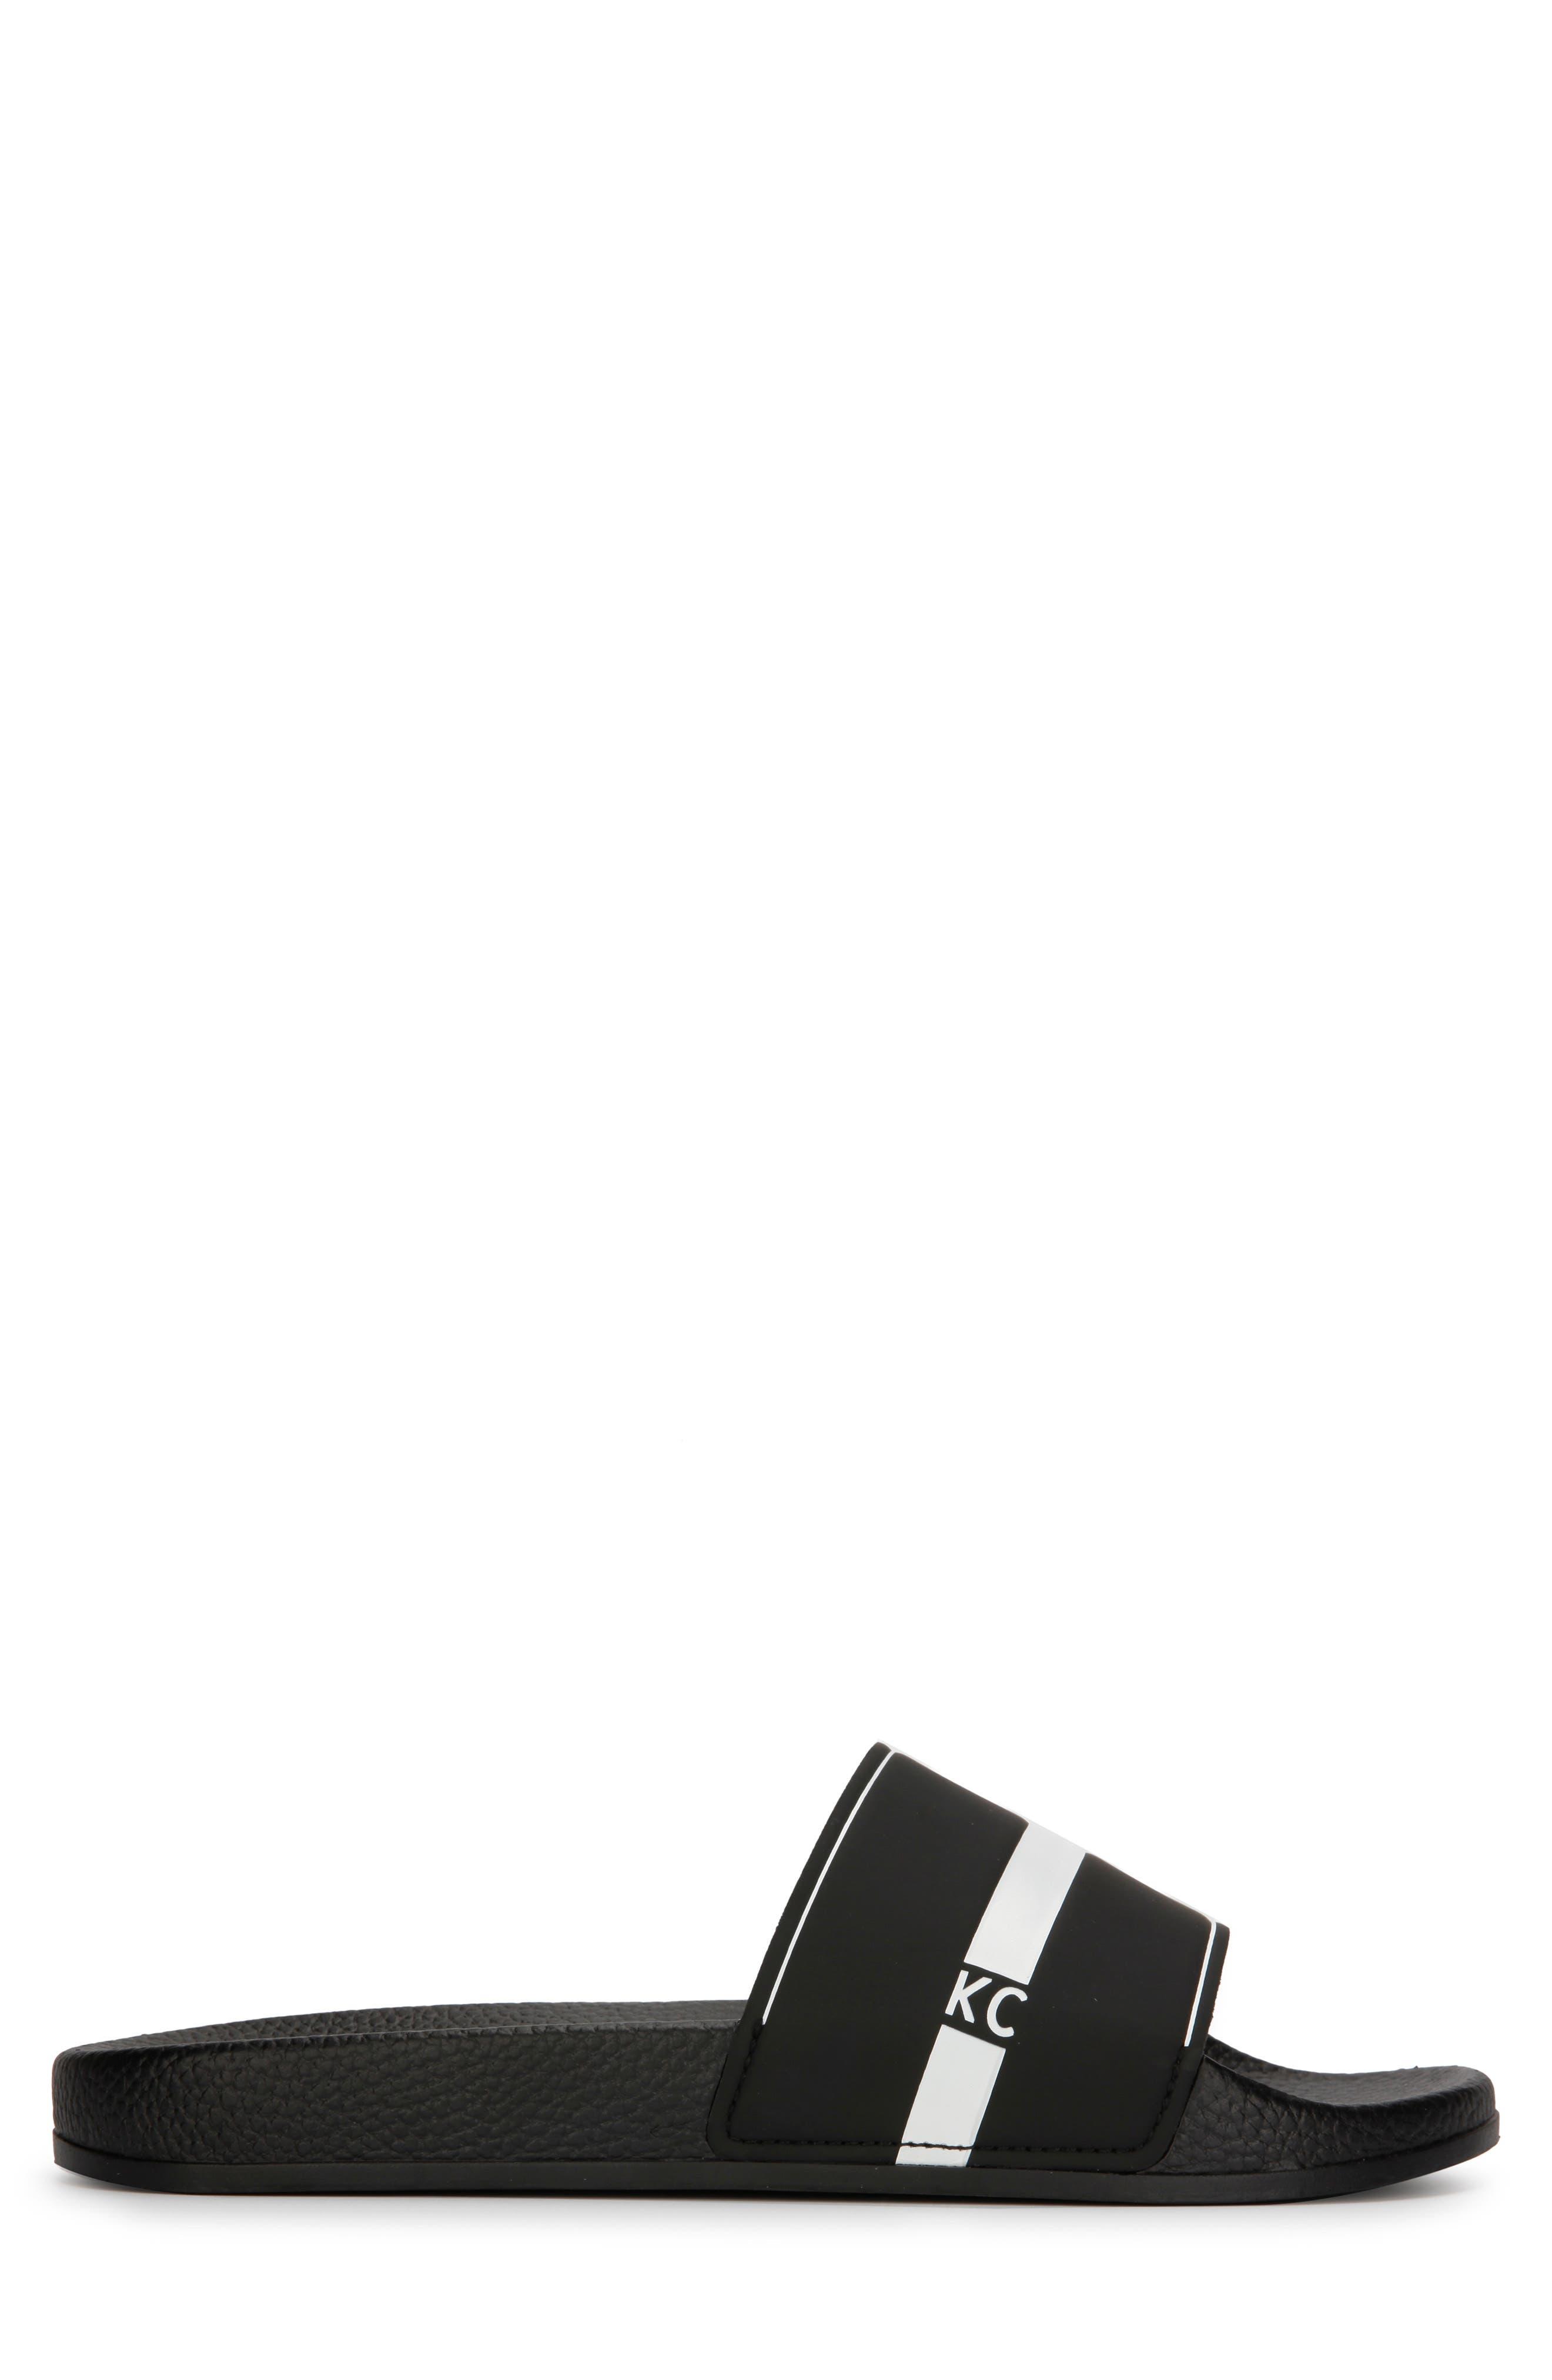 REACTION KENNETH COLE, Slide, Alternate thumbnail 2, color, BLACK/ WHITE